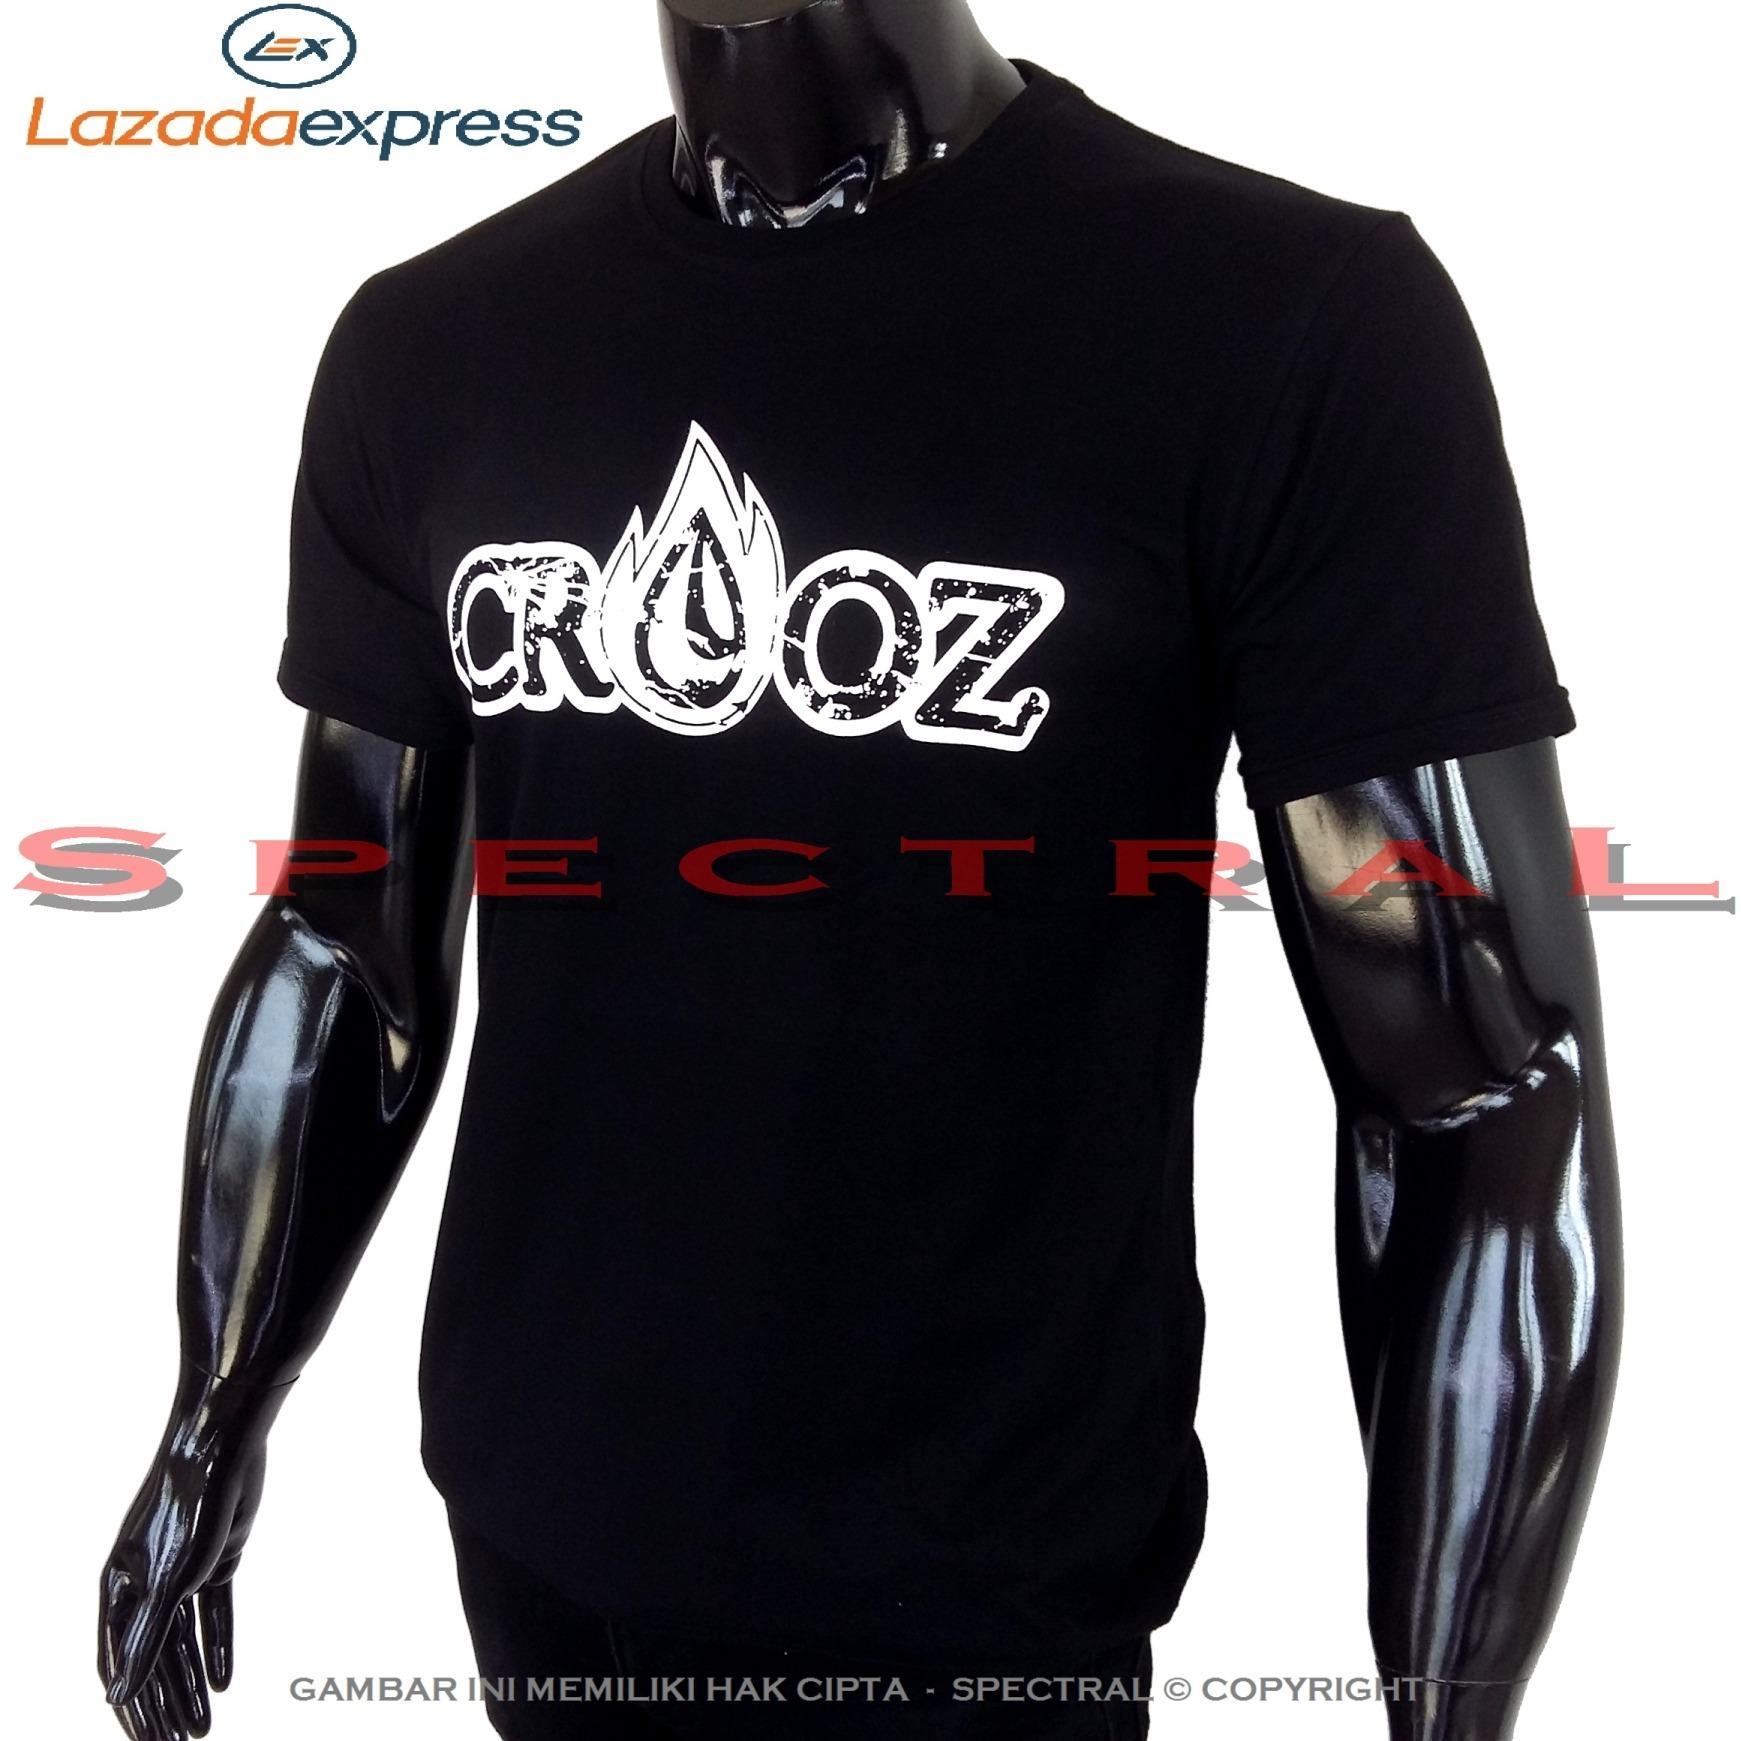 Spectral – CROOZ 100% Soft Cotton Combed 30s Kaos Distro Fashion T-Shirt Atasan Oblong Baju Pakaian Polos Shirt Pria Wanita Cewe Cowo  Lengan Murah Bagus Keren Jaman Kekinian Jakarta Bandung Hitam Gambar Crot Crozz Merek Kata Tulisan 420 4.20